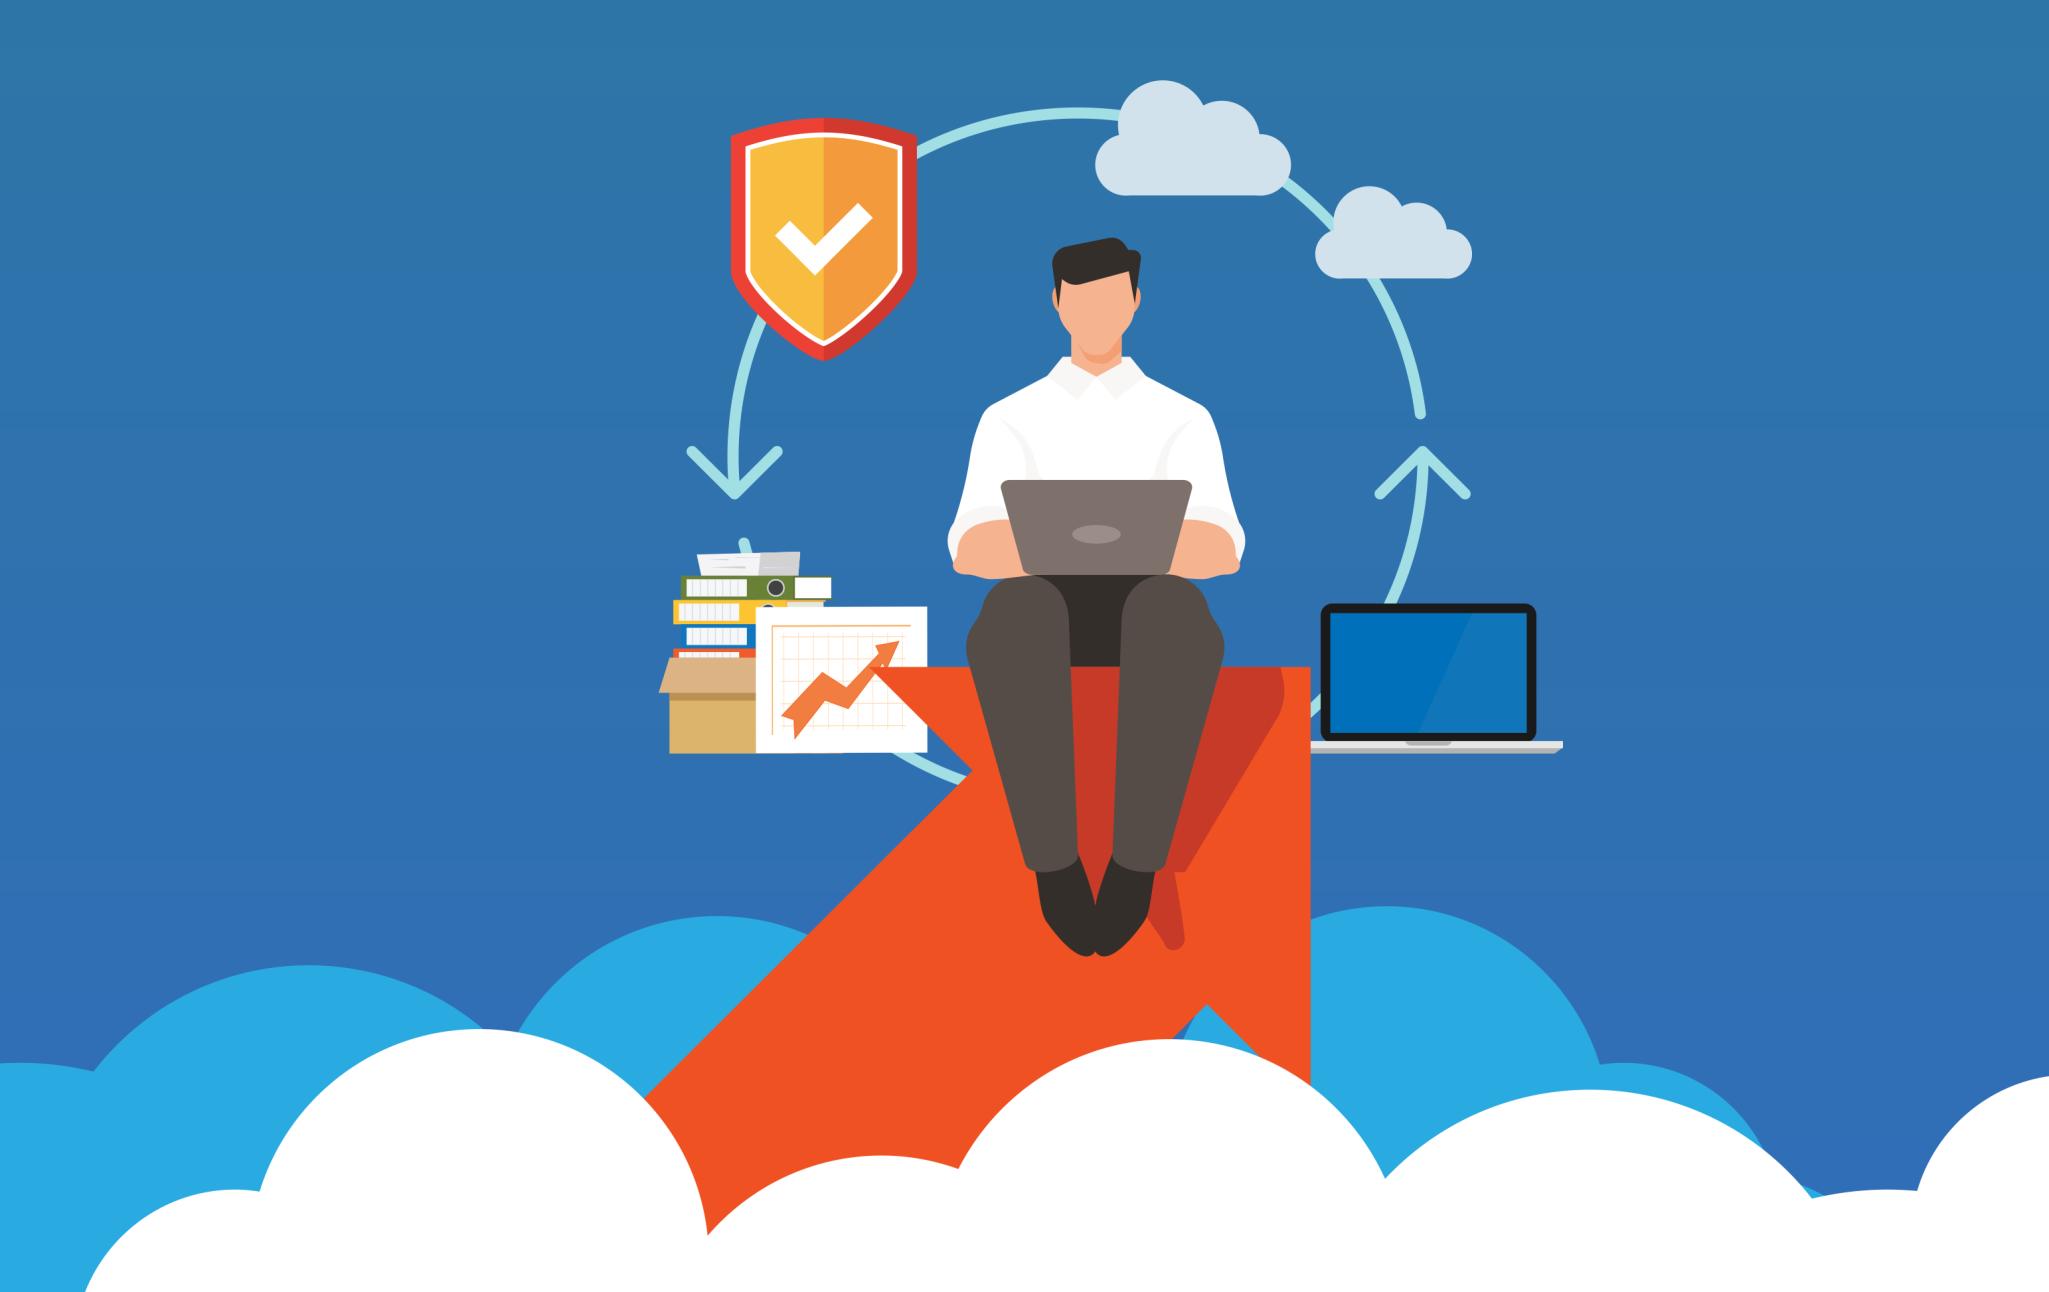 7 Benefits of Cloud Computing for Accountants